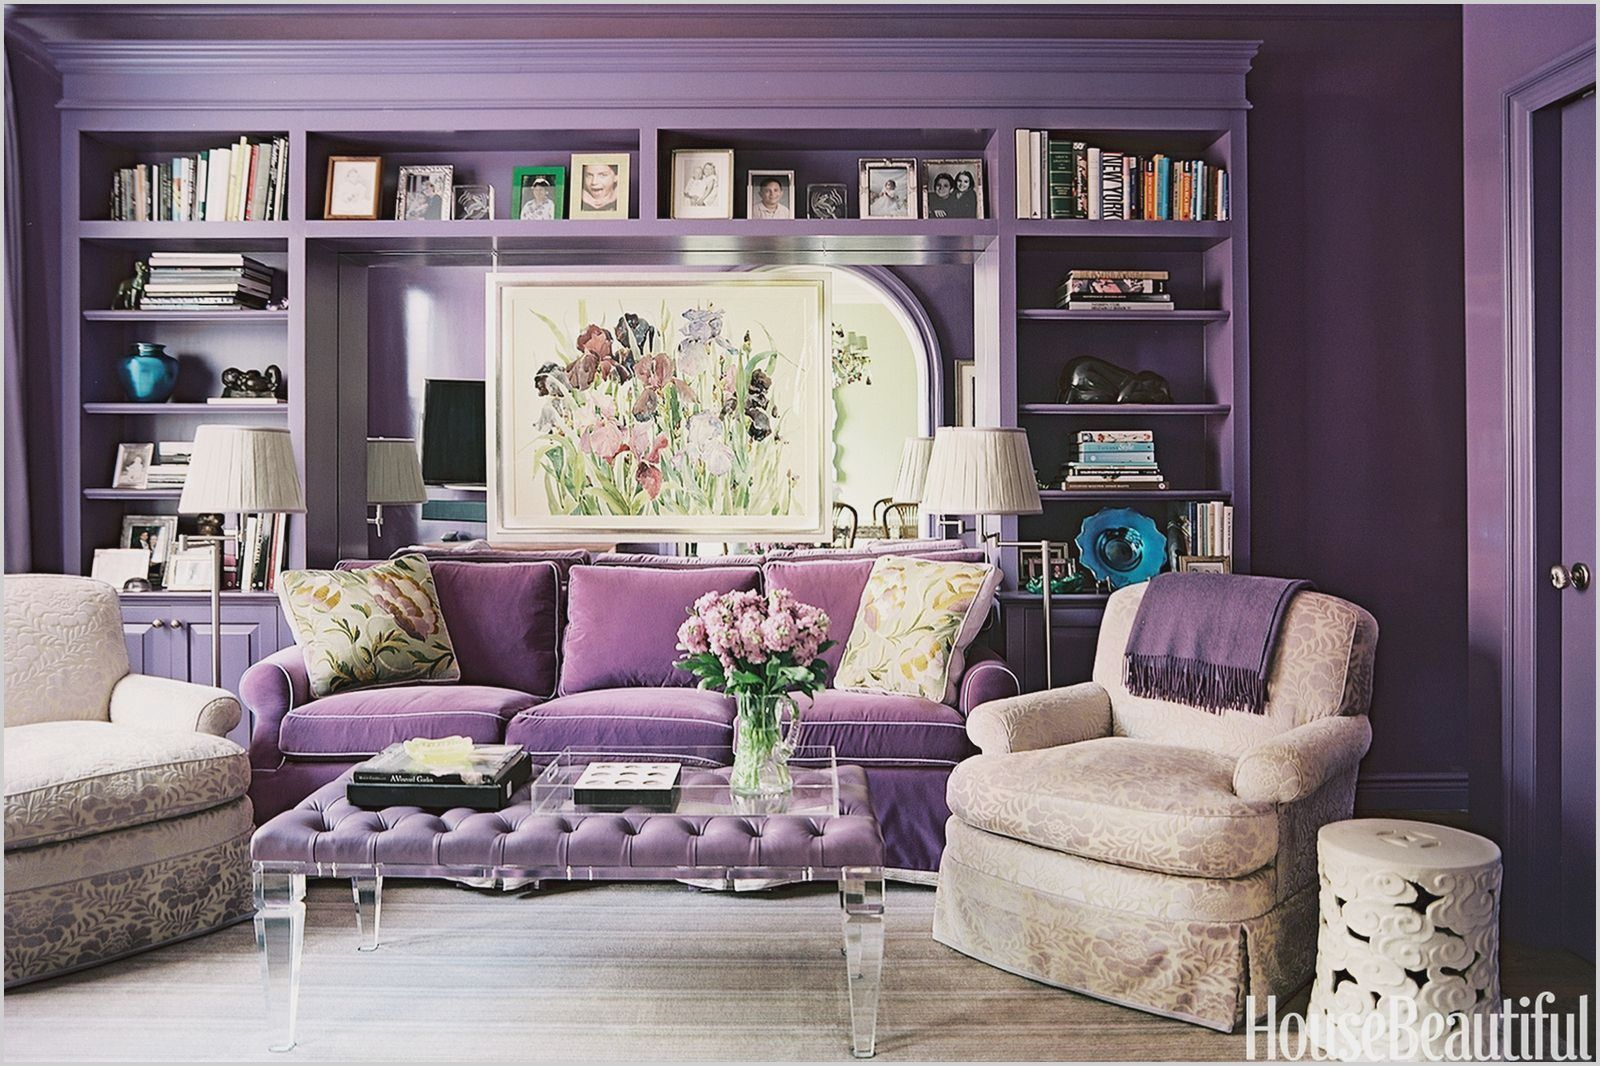 Lavender Bedroom Decorating Ideas In 2020 Purple Living Room Purple Room Decor Lavender Living Rooms #purple #and #white #living #room #ideas